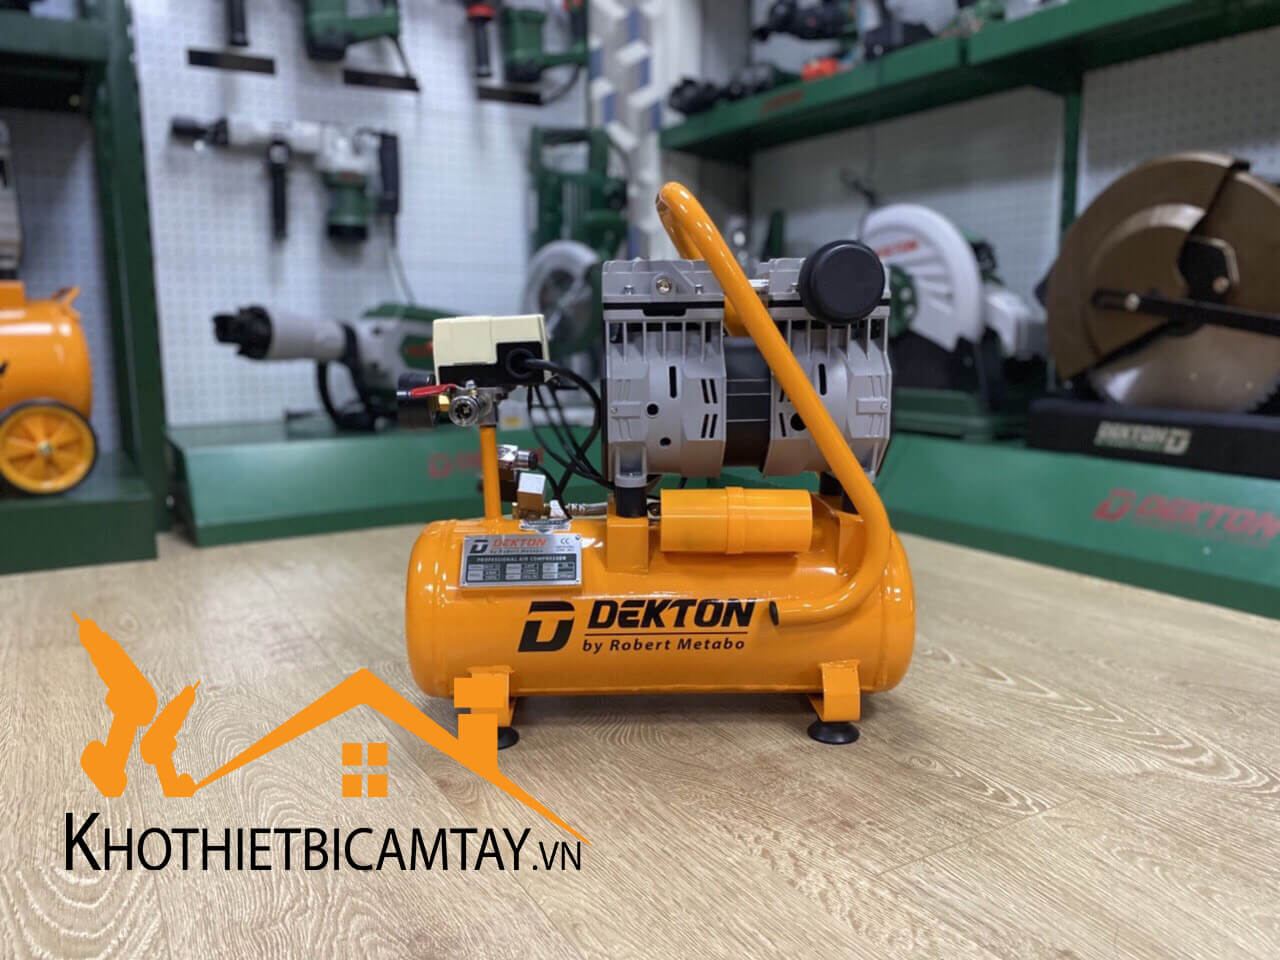 Bơm hơi không dầu Dekton DK29-12